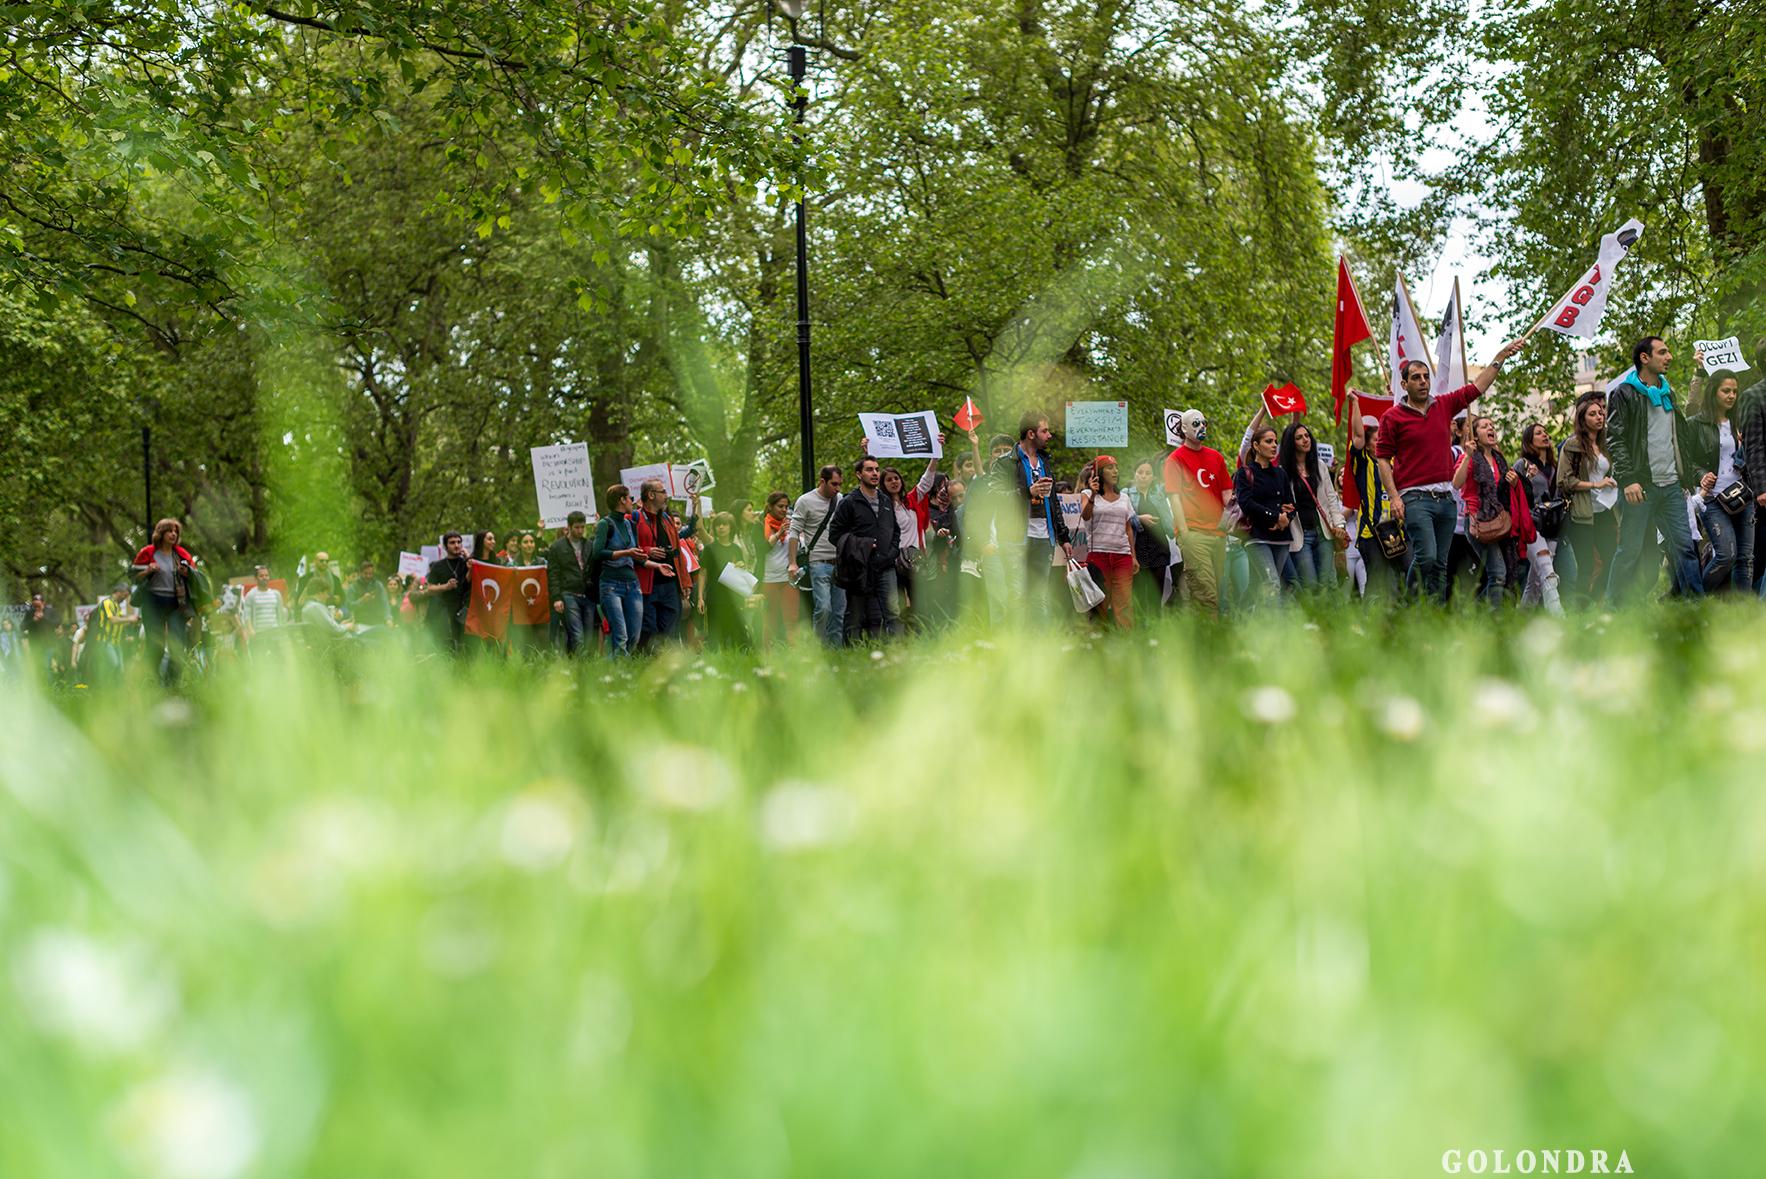 Protesting Turkish Government - Turk Hukumetini Protesto - Londra - London (32)